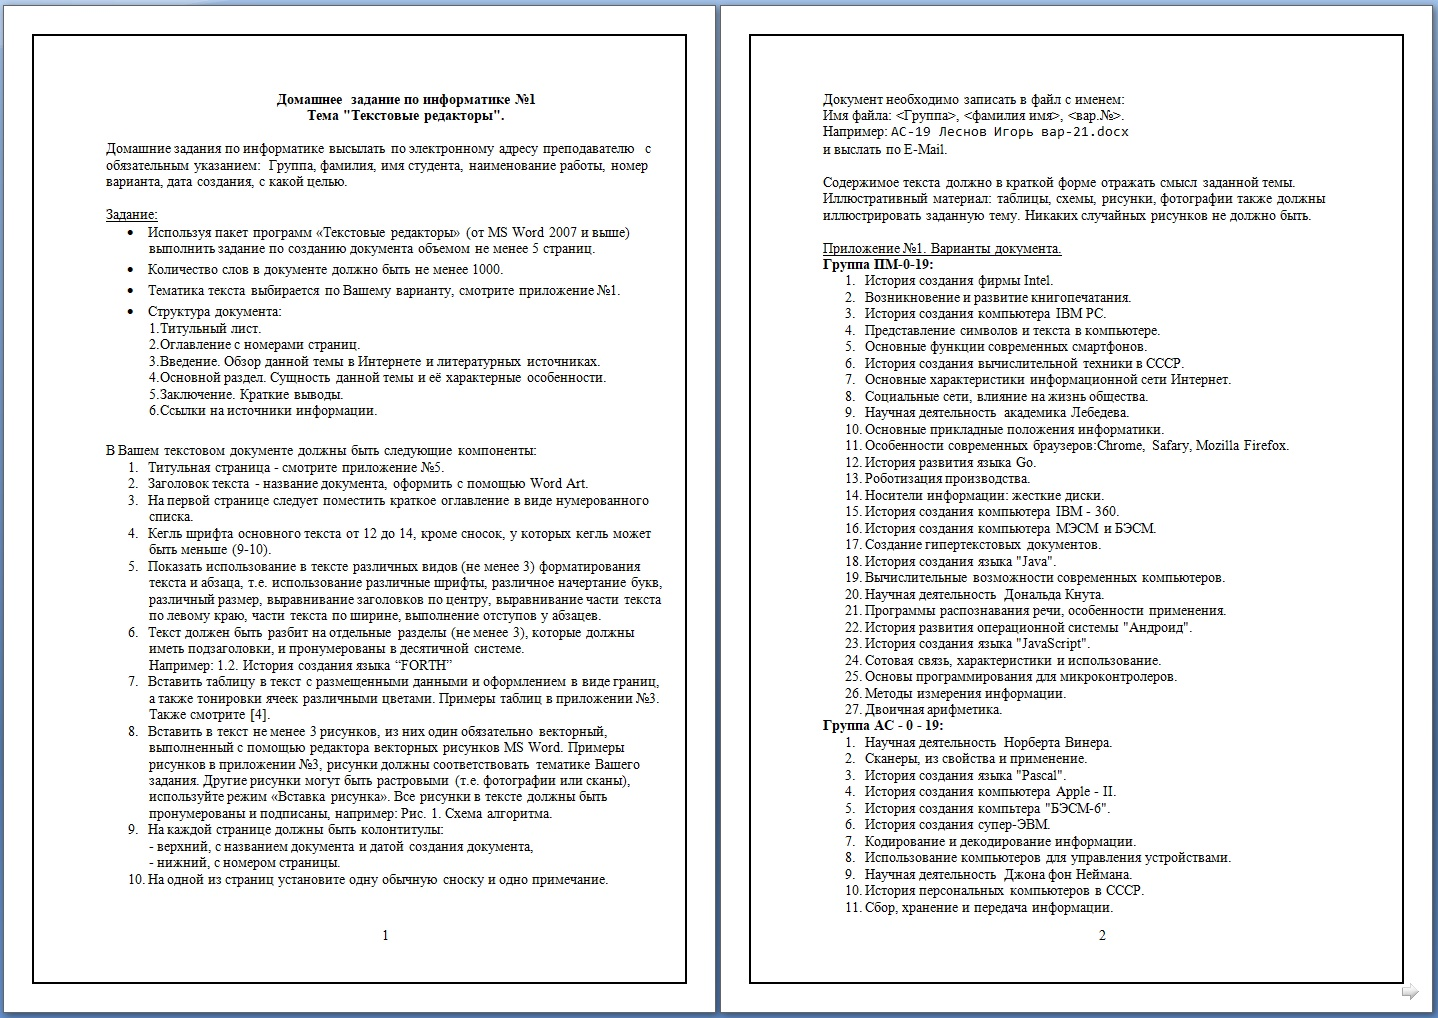 90-pm-as-atpp-dr-1-tekst-redaktor_11